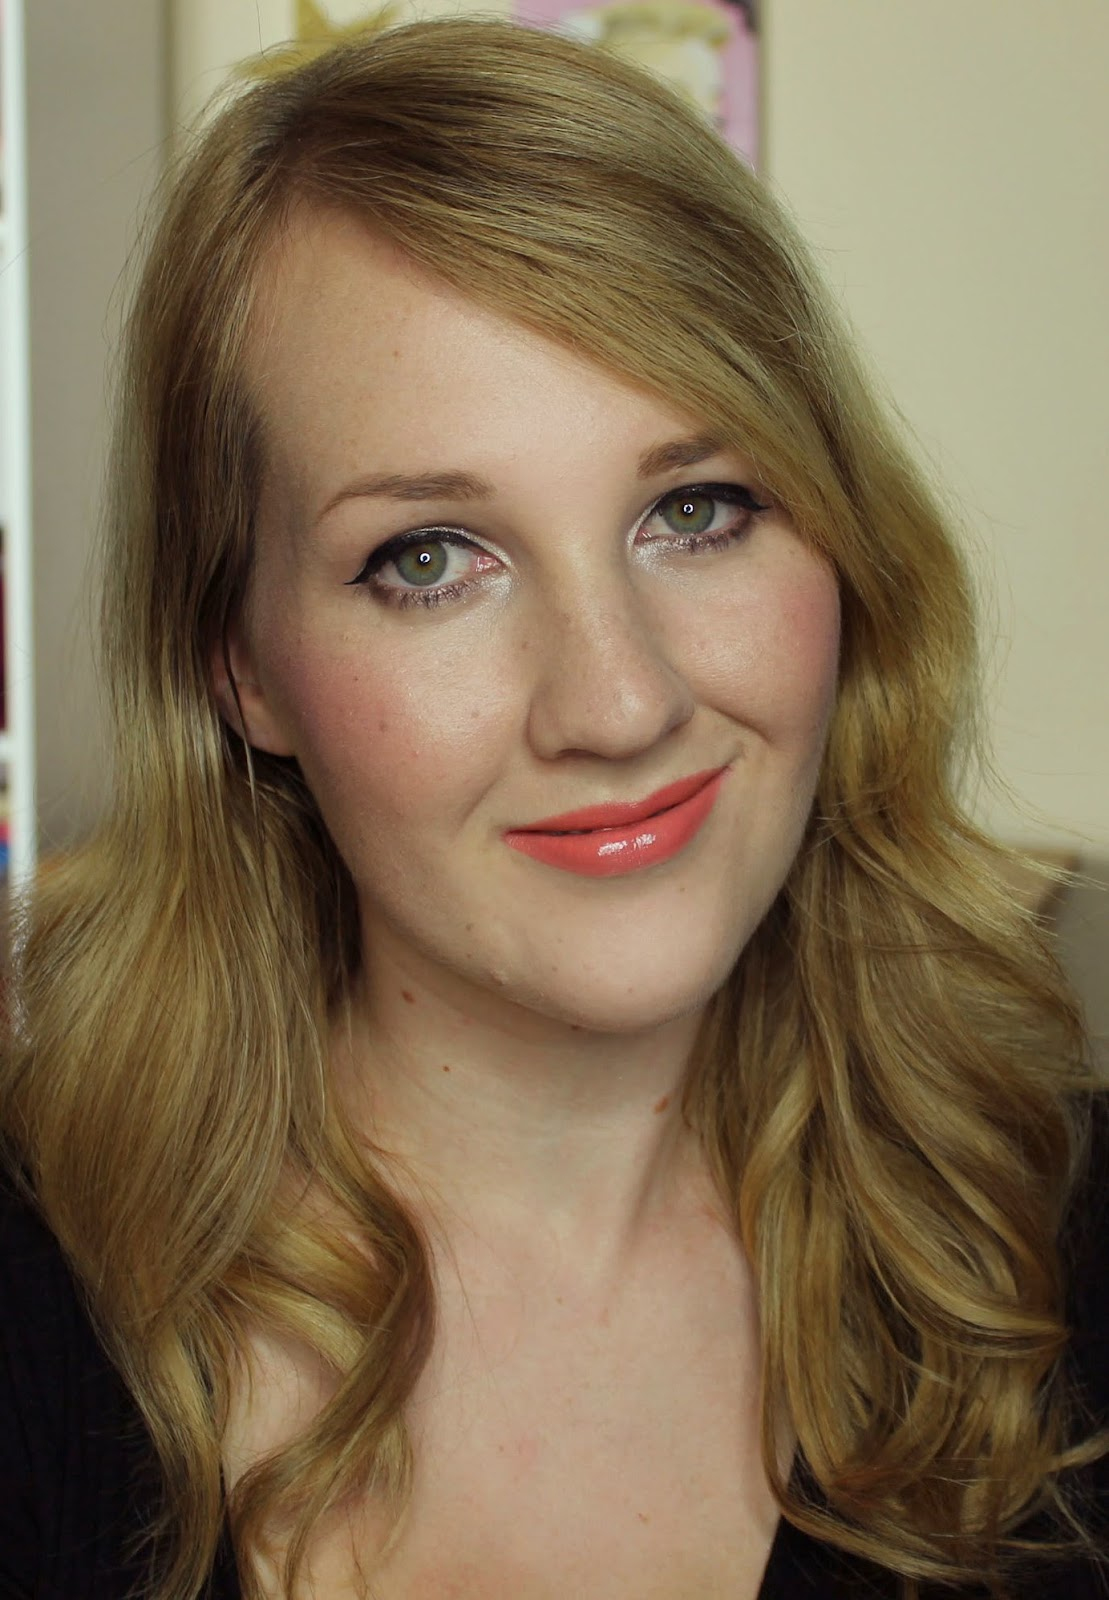 ZA Vibrant Moist Lipstick - OR222 swatches & review